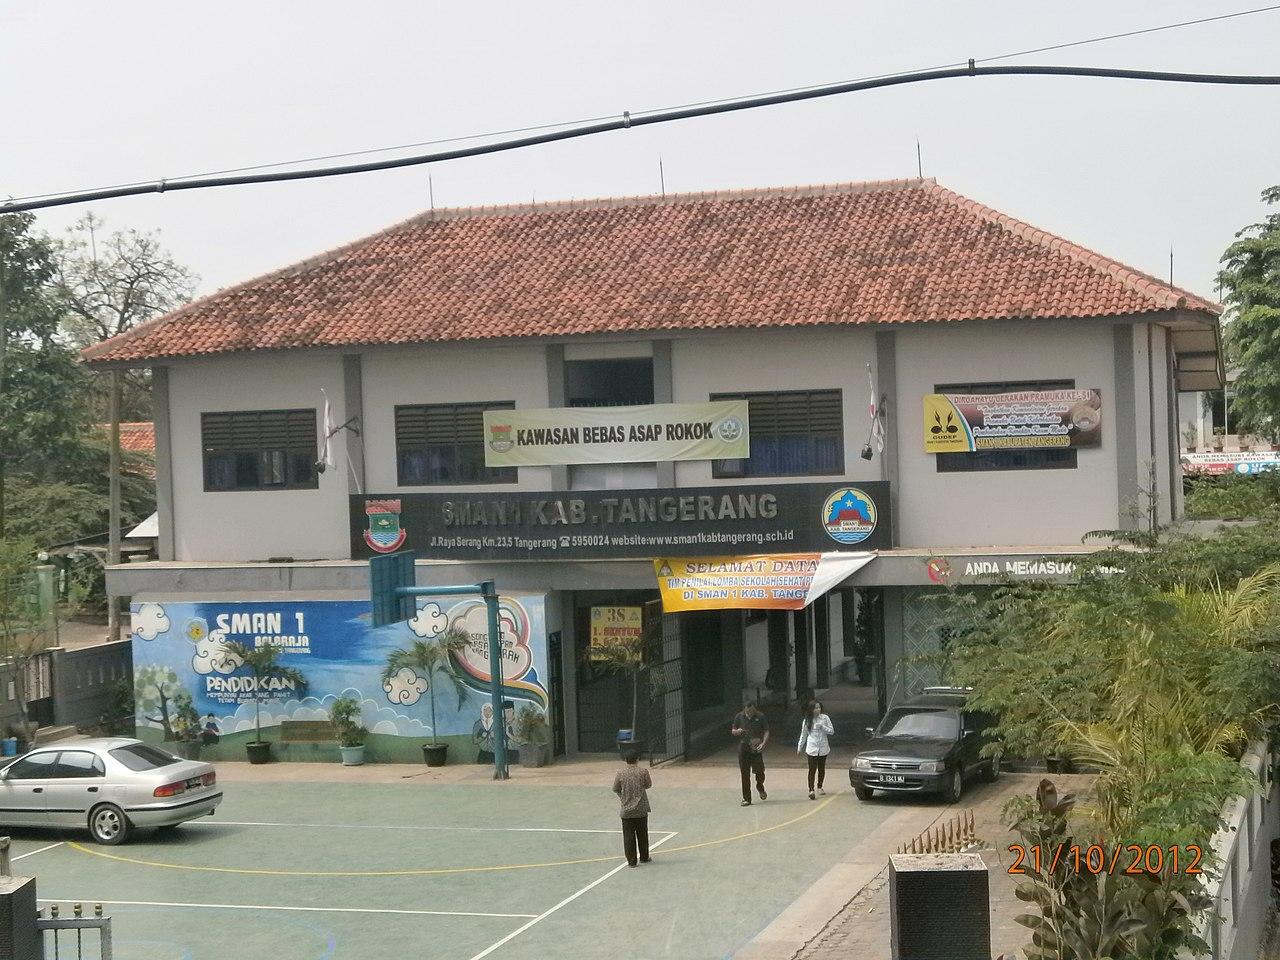 File Sman 1 Kab Tangerang Panoramio Jpg Wikimedia Commons